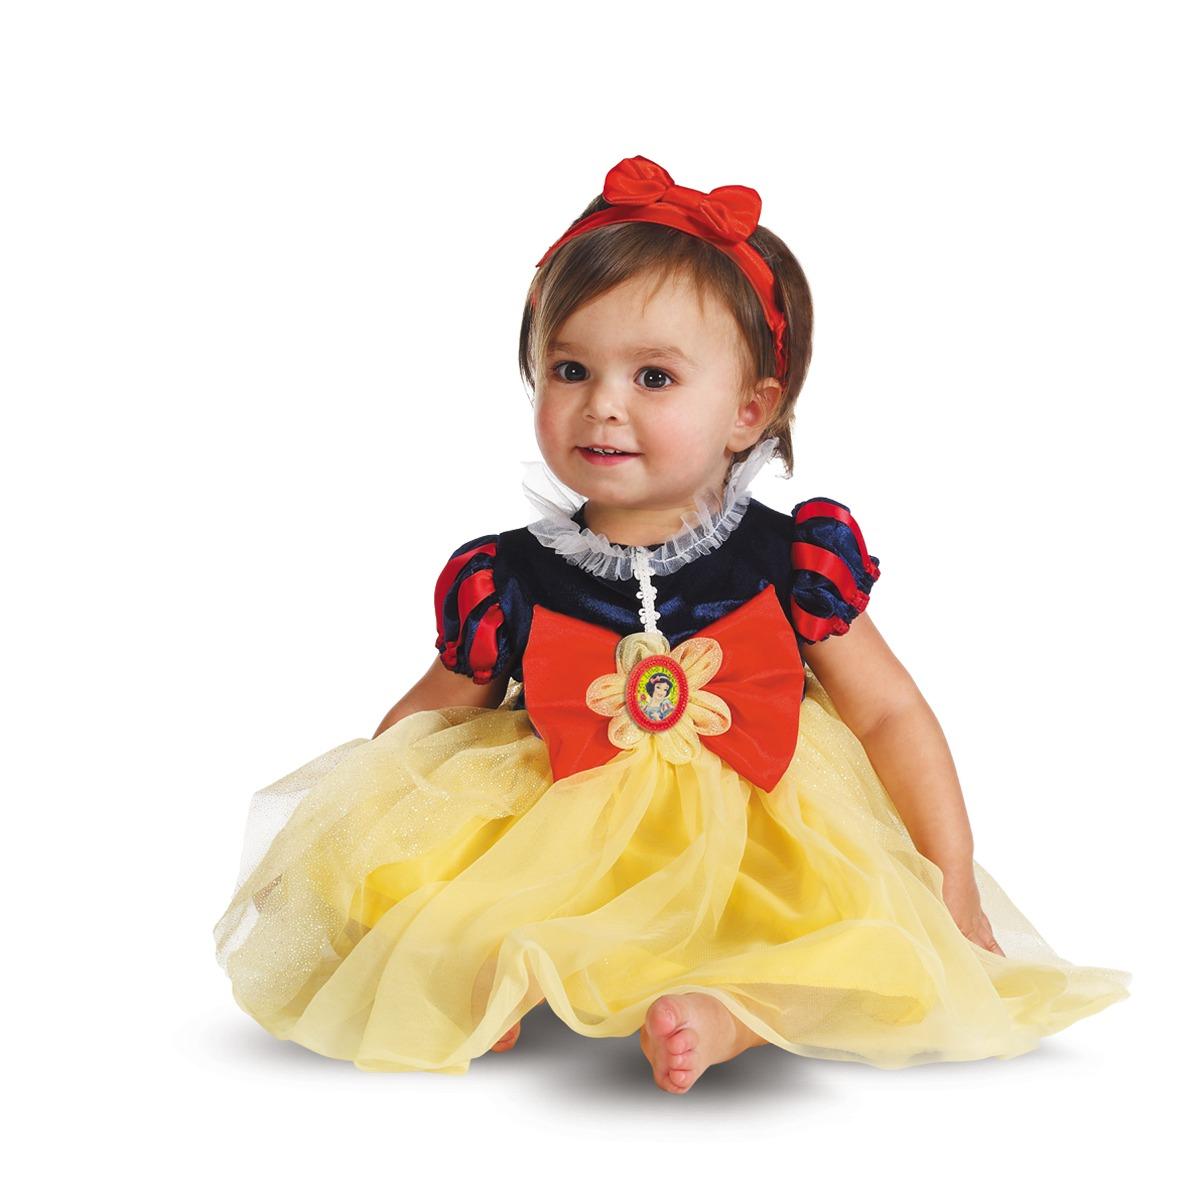 Disfraz Calabaza Bebe Halloween 59000 en Mercado Libre